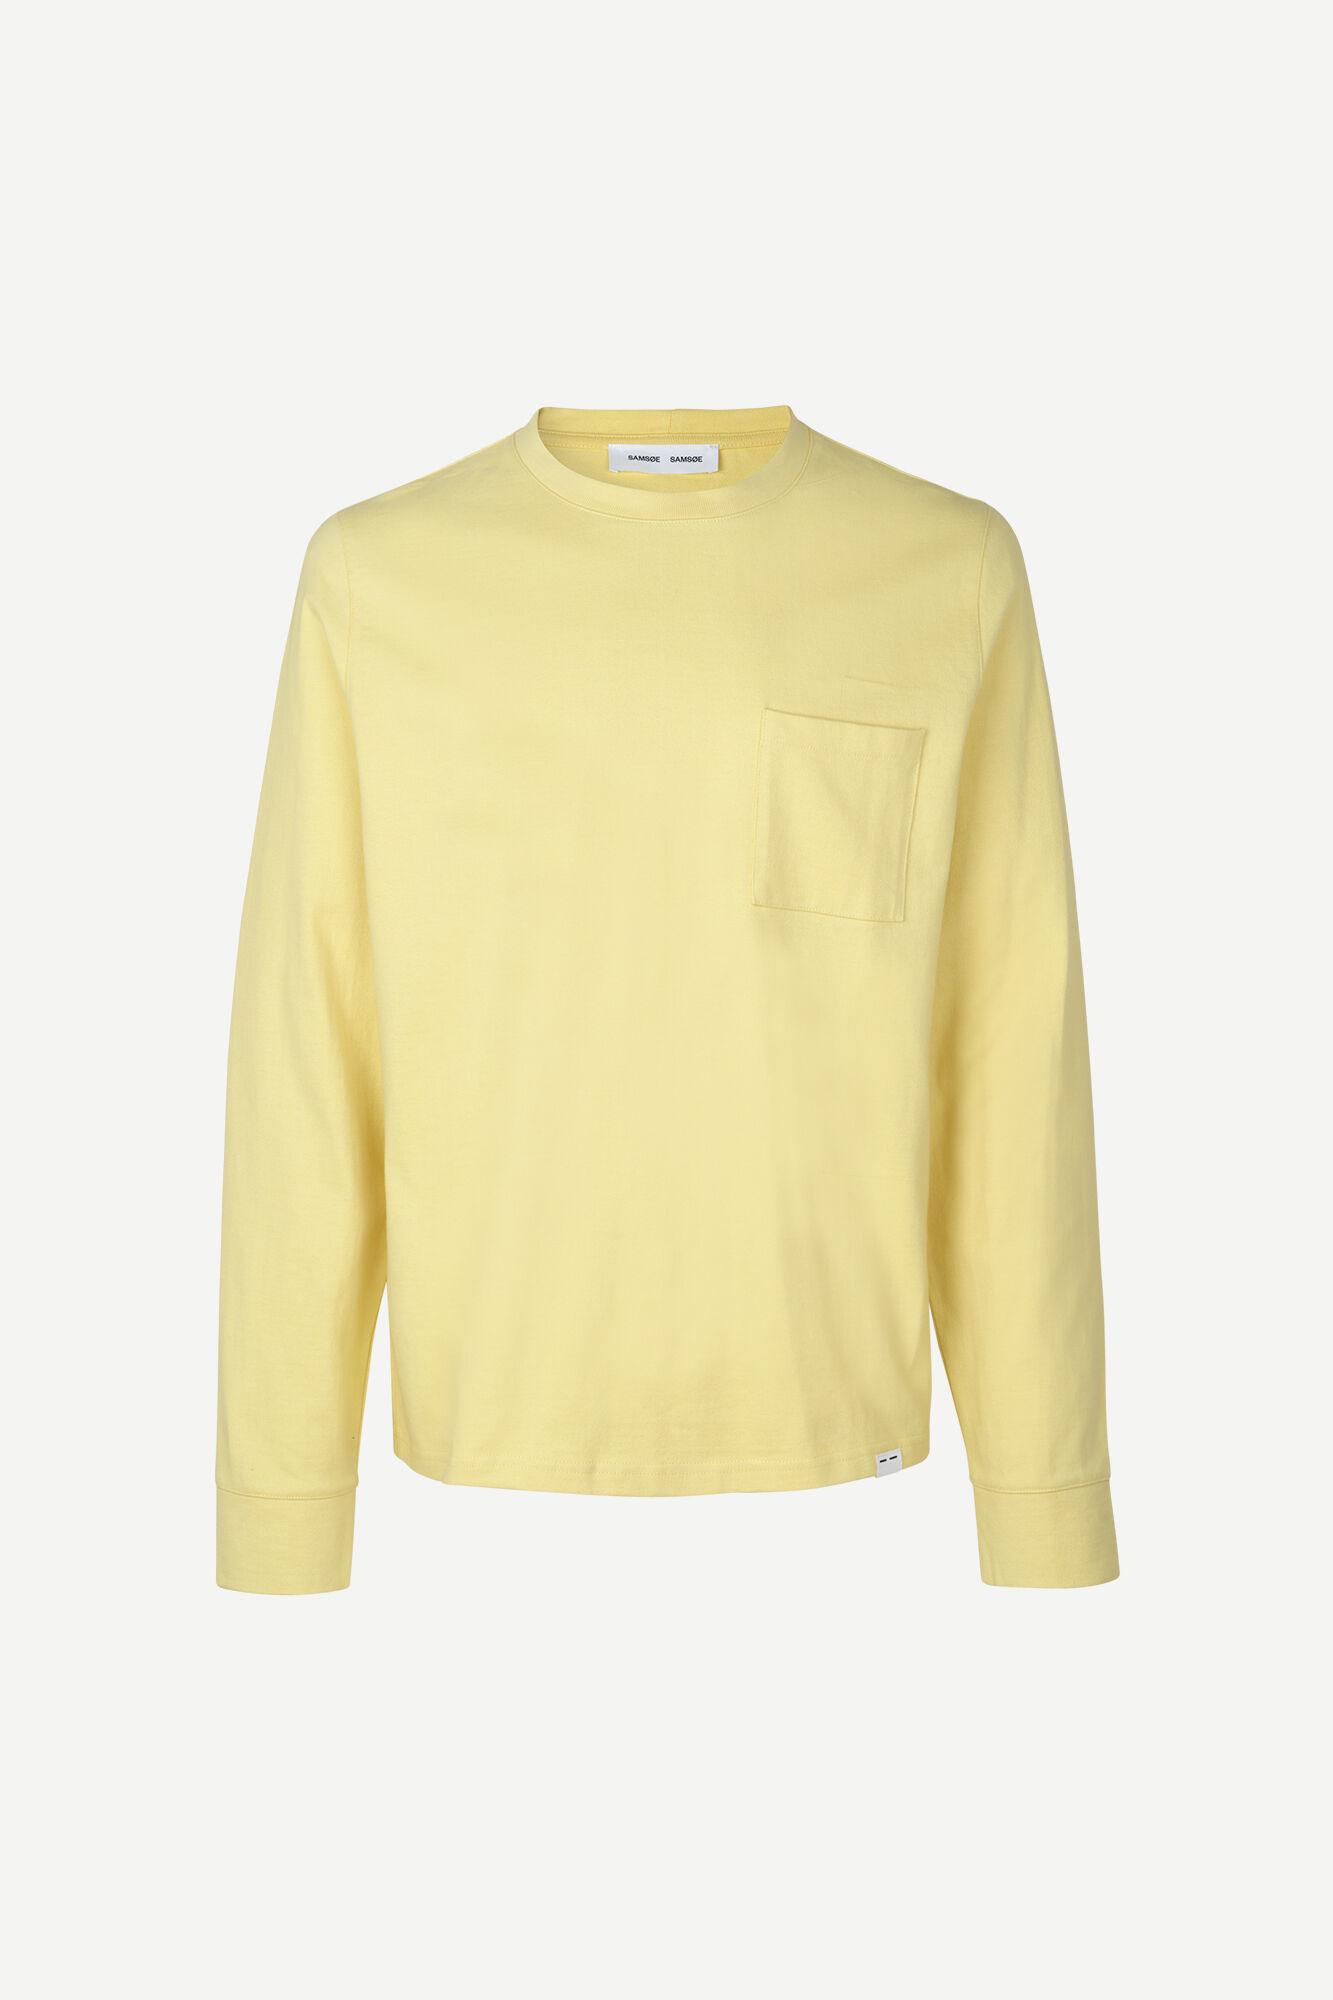 Arrie T-Shirt Ananas Slice Groen-1